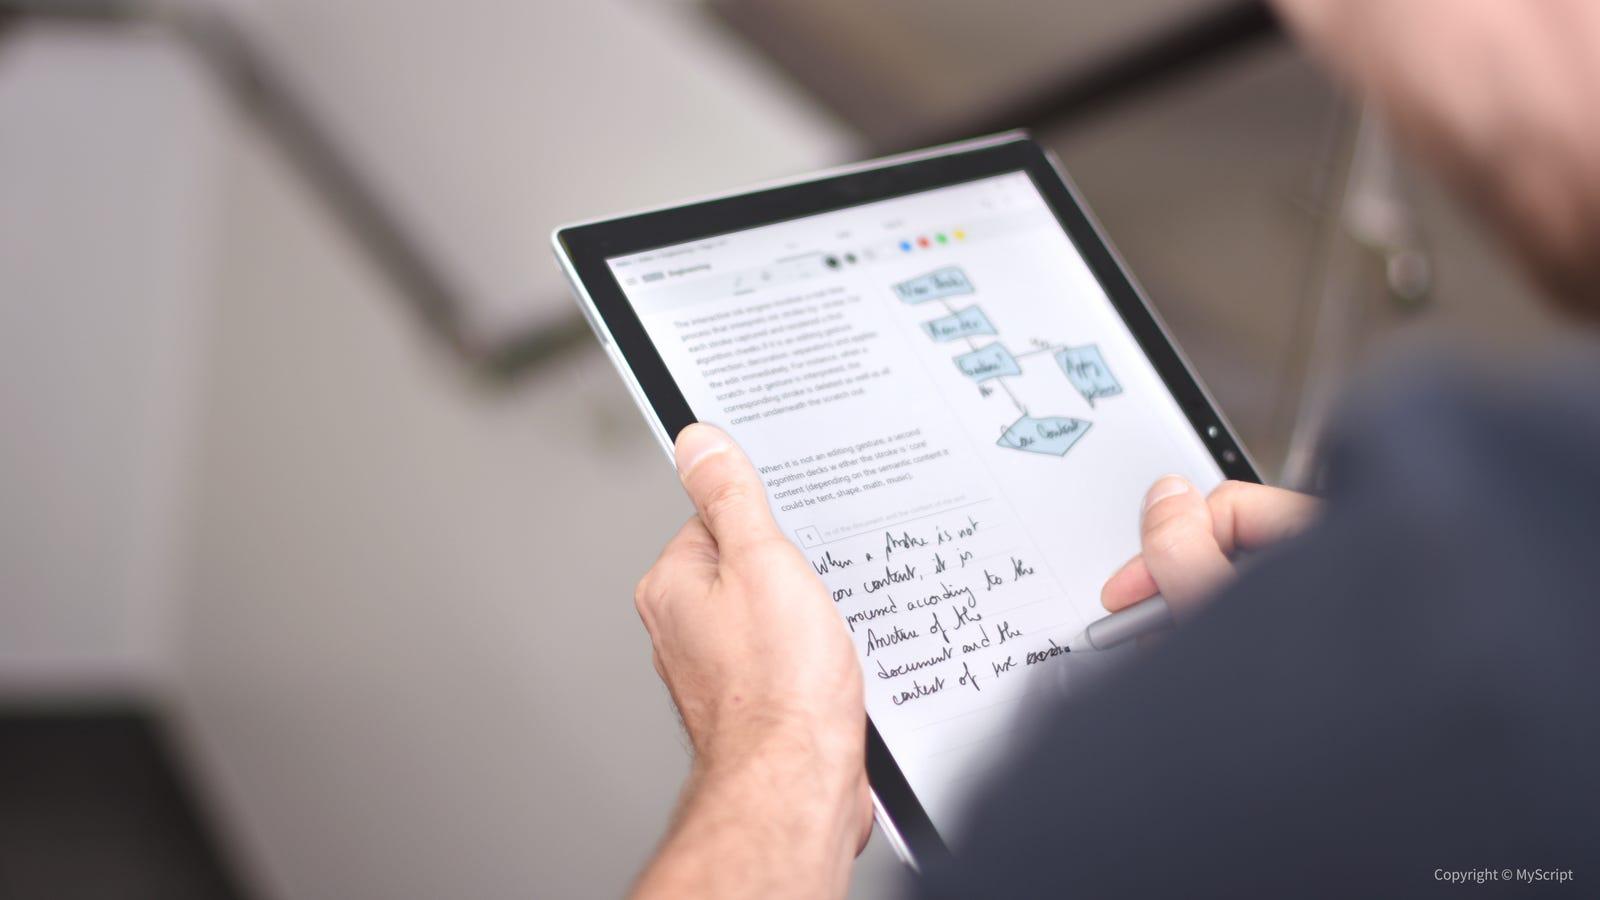 ipad pro app handwriting to text